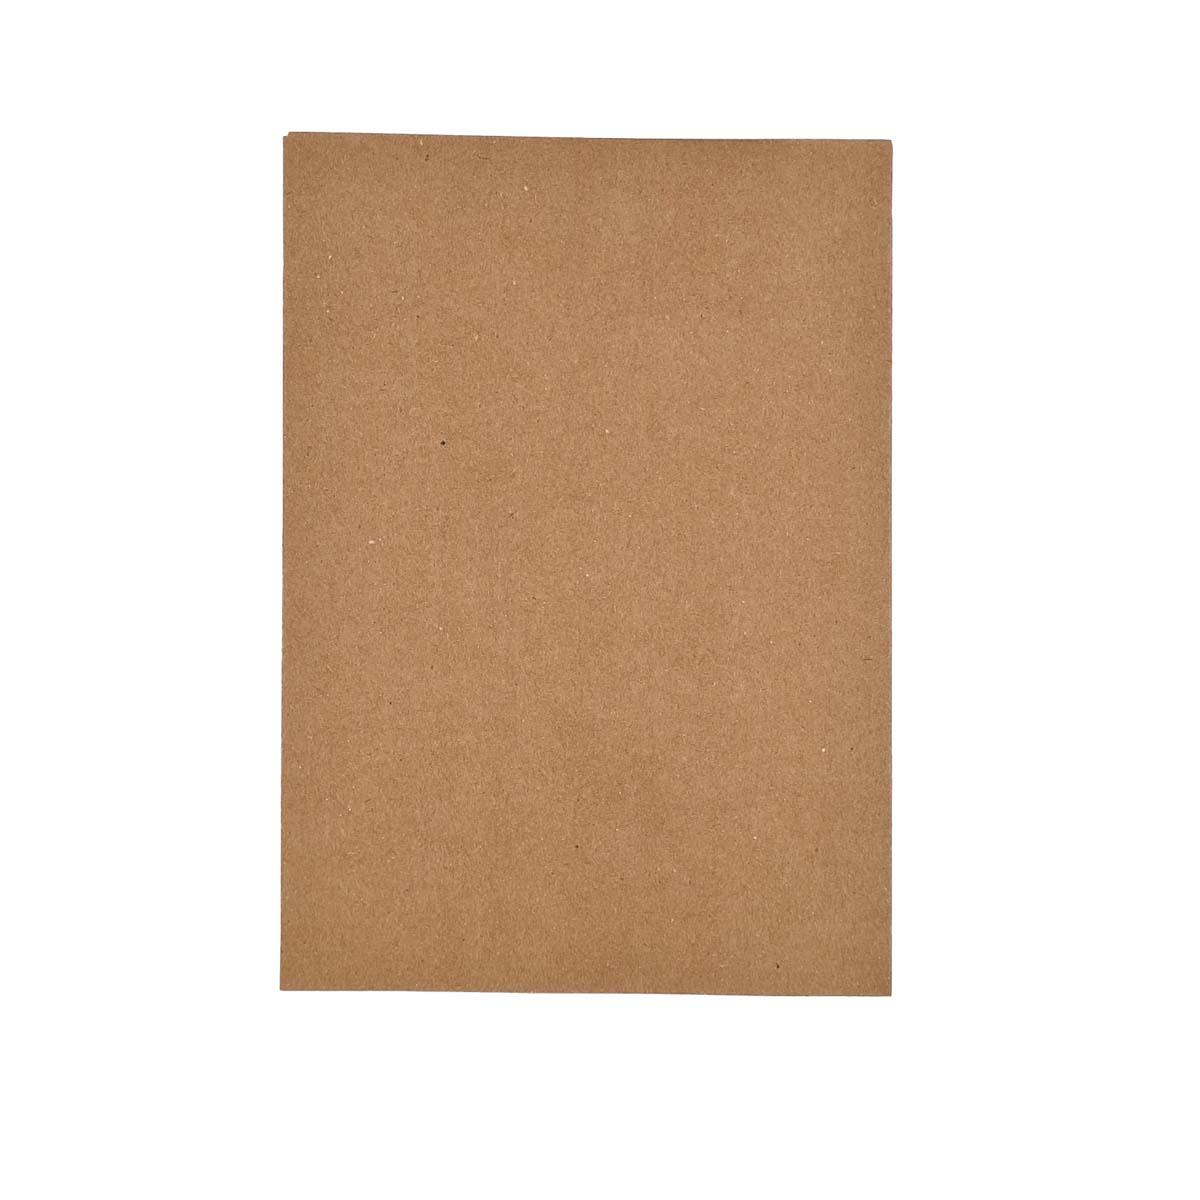 Envelope Saco kraft Natural 80g 162x229 meio A4 Foroni com 250un